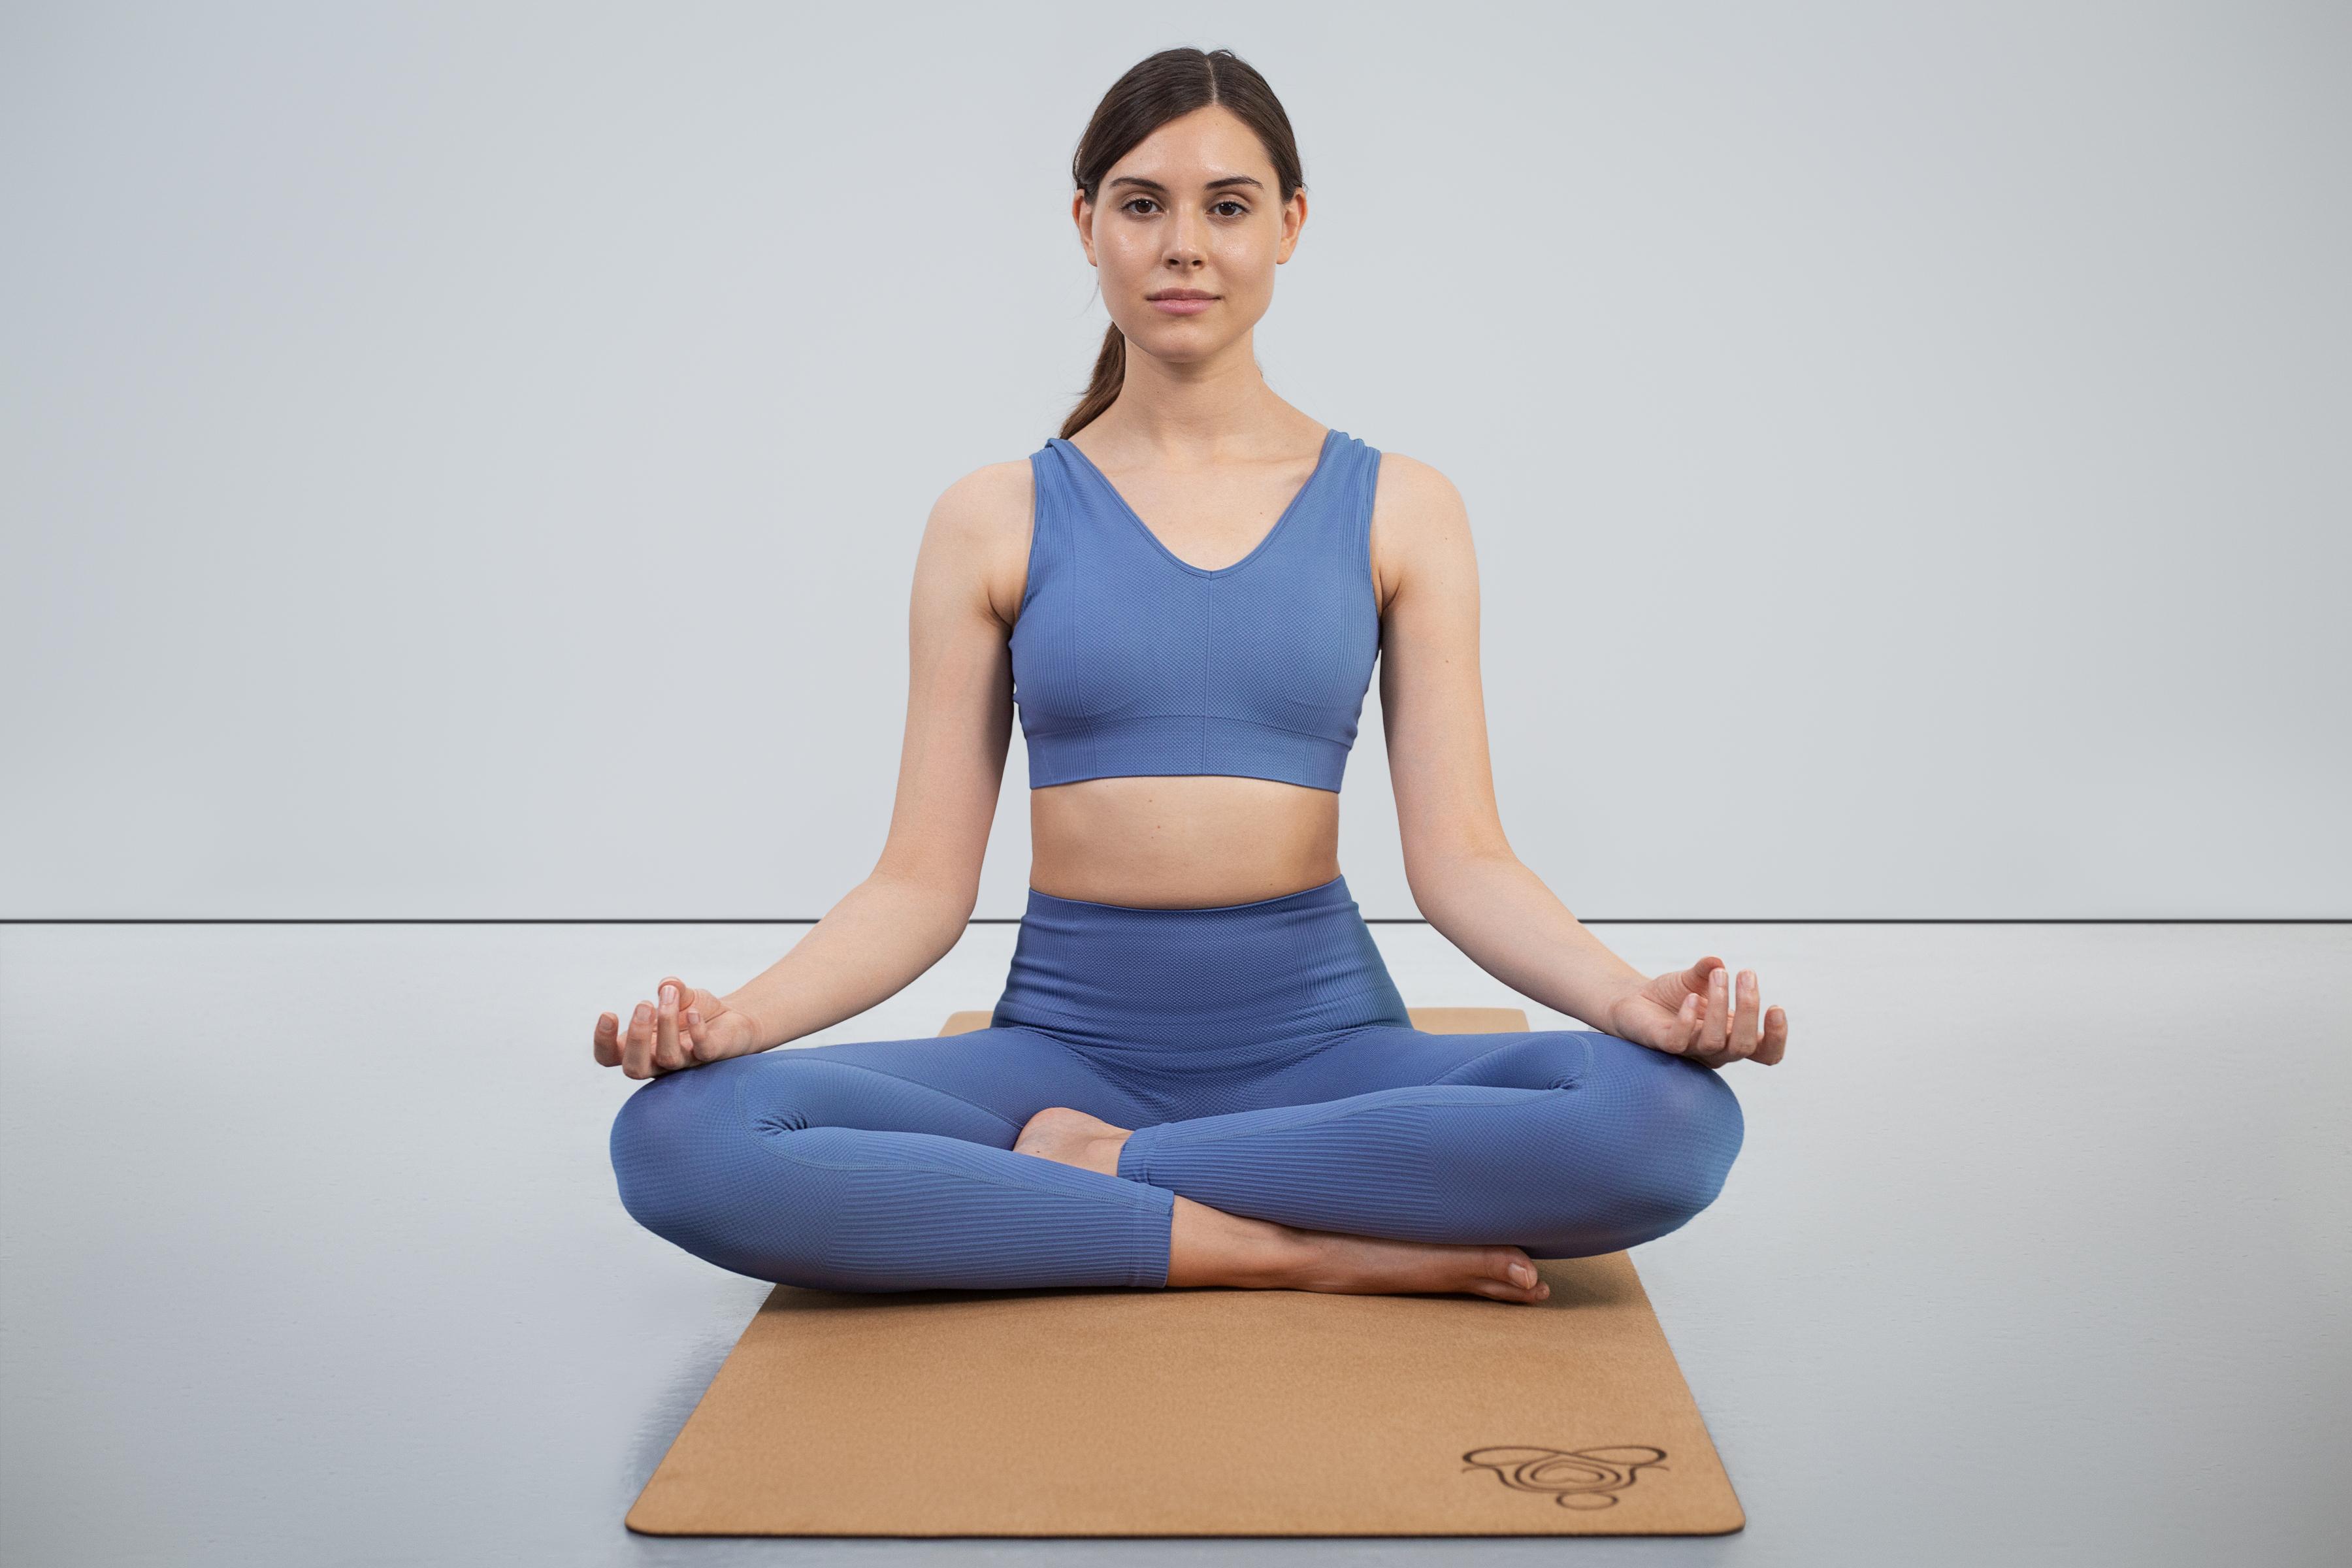 Company behind non-slip cork yoga mat launches Kickstarter campaign